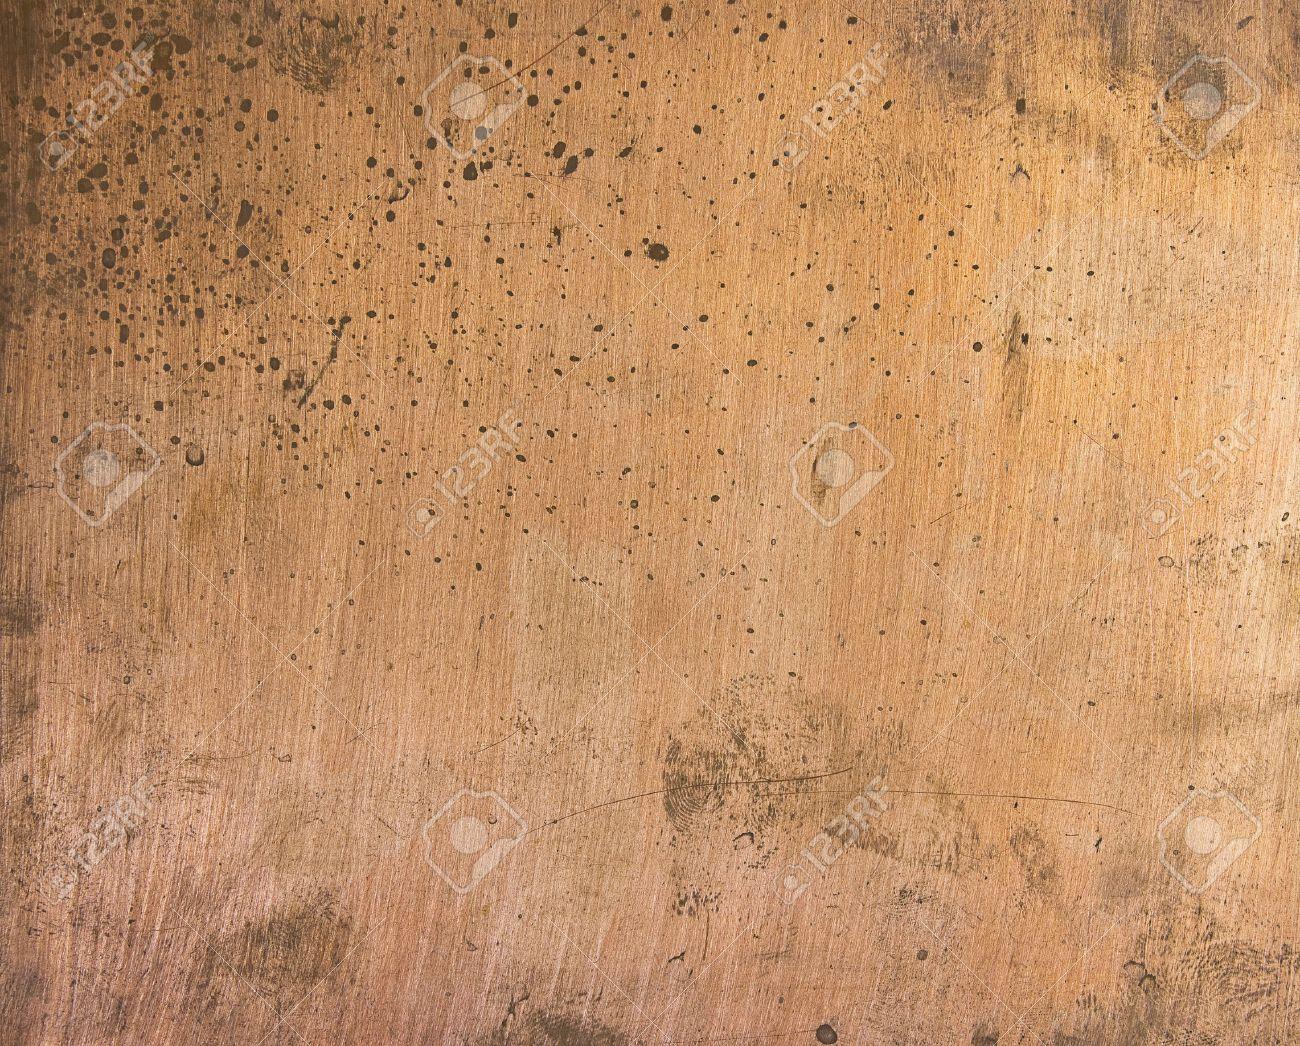 copper plate texture - 40288385